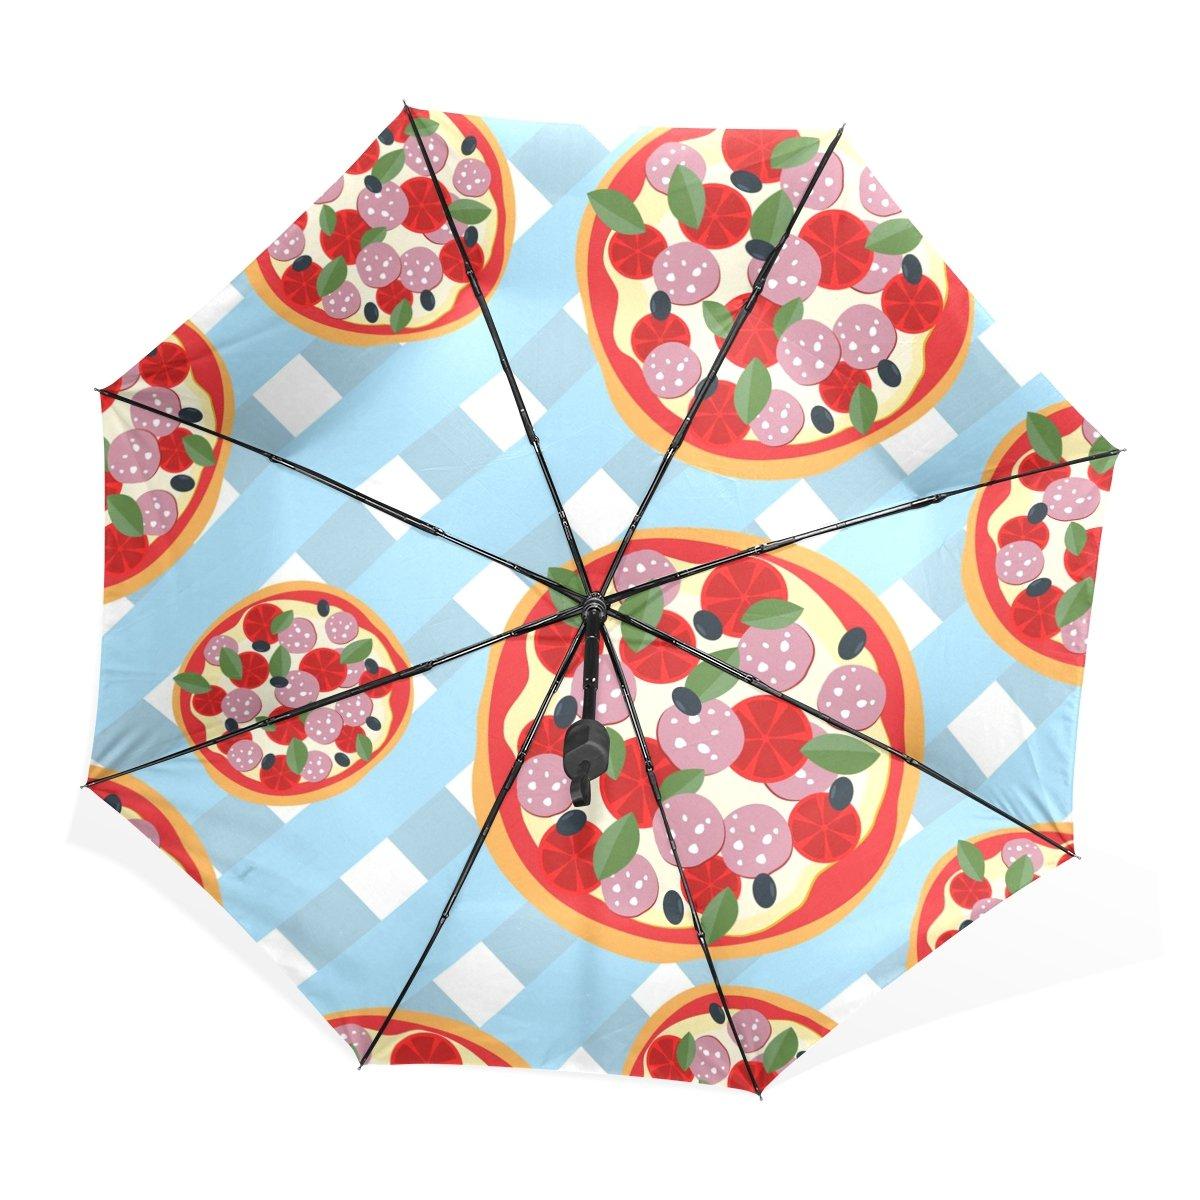 Amazon.com: BAIHUISHOP 3 Folding with Chocolate Pattern UV Umbrella,Ultralight Folding Compact Sun/Rain Umbrella UPF 50+ UV Protected Parasol: Sports & ...